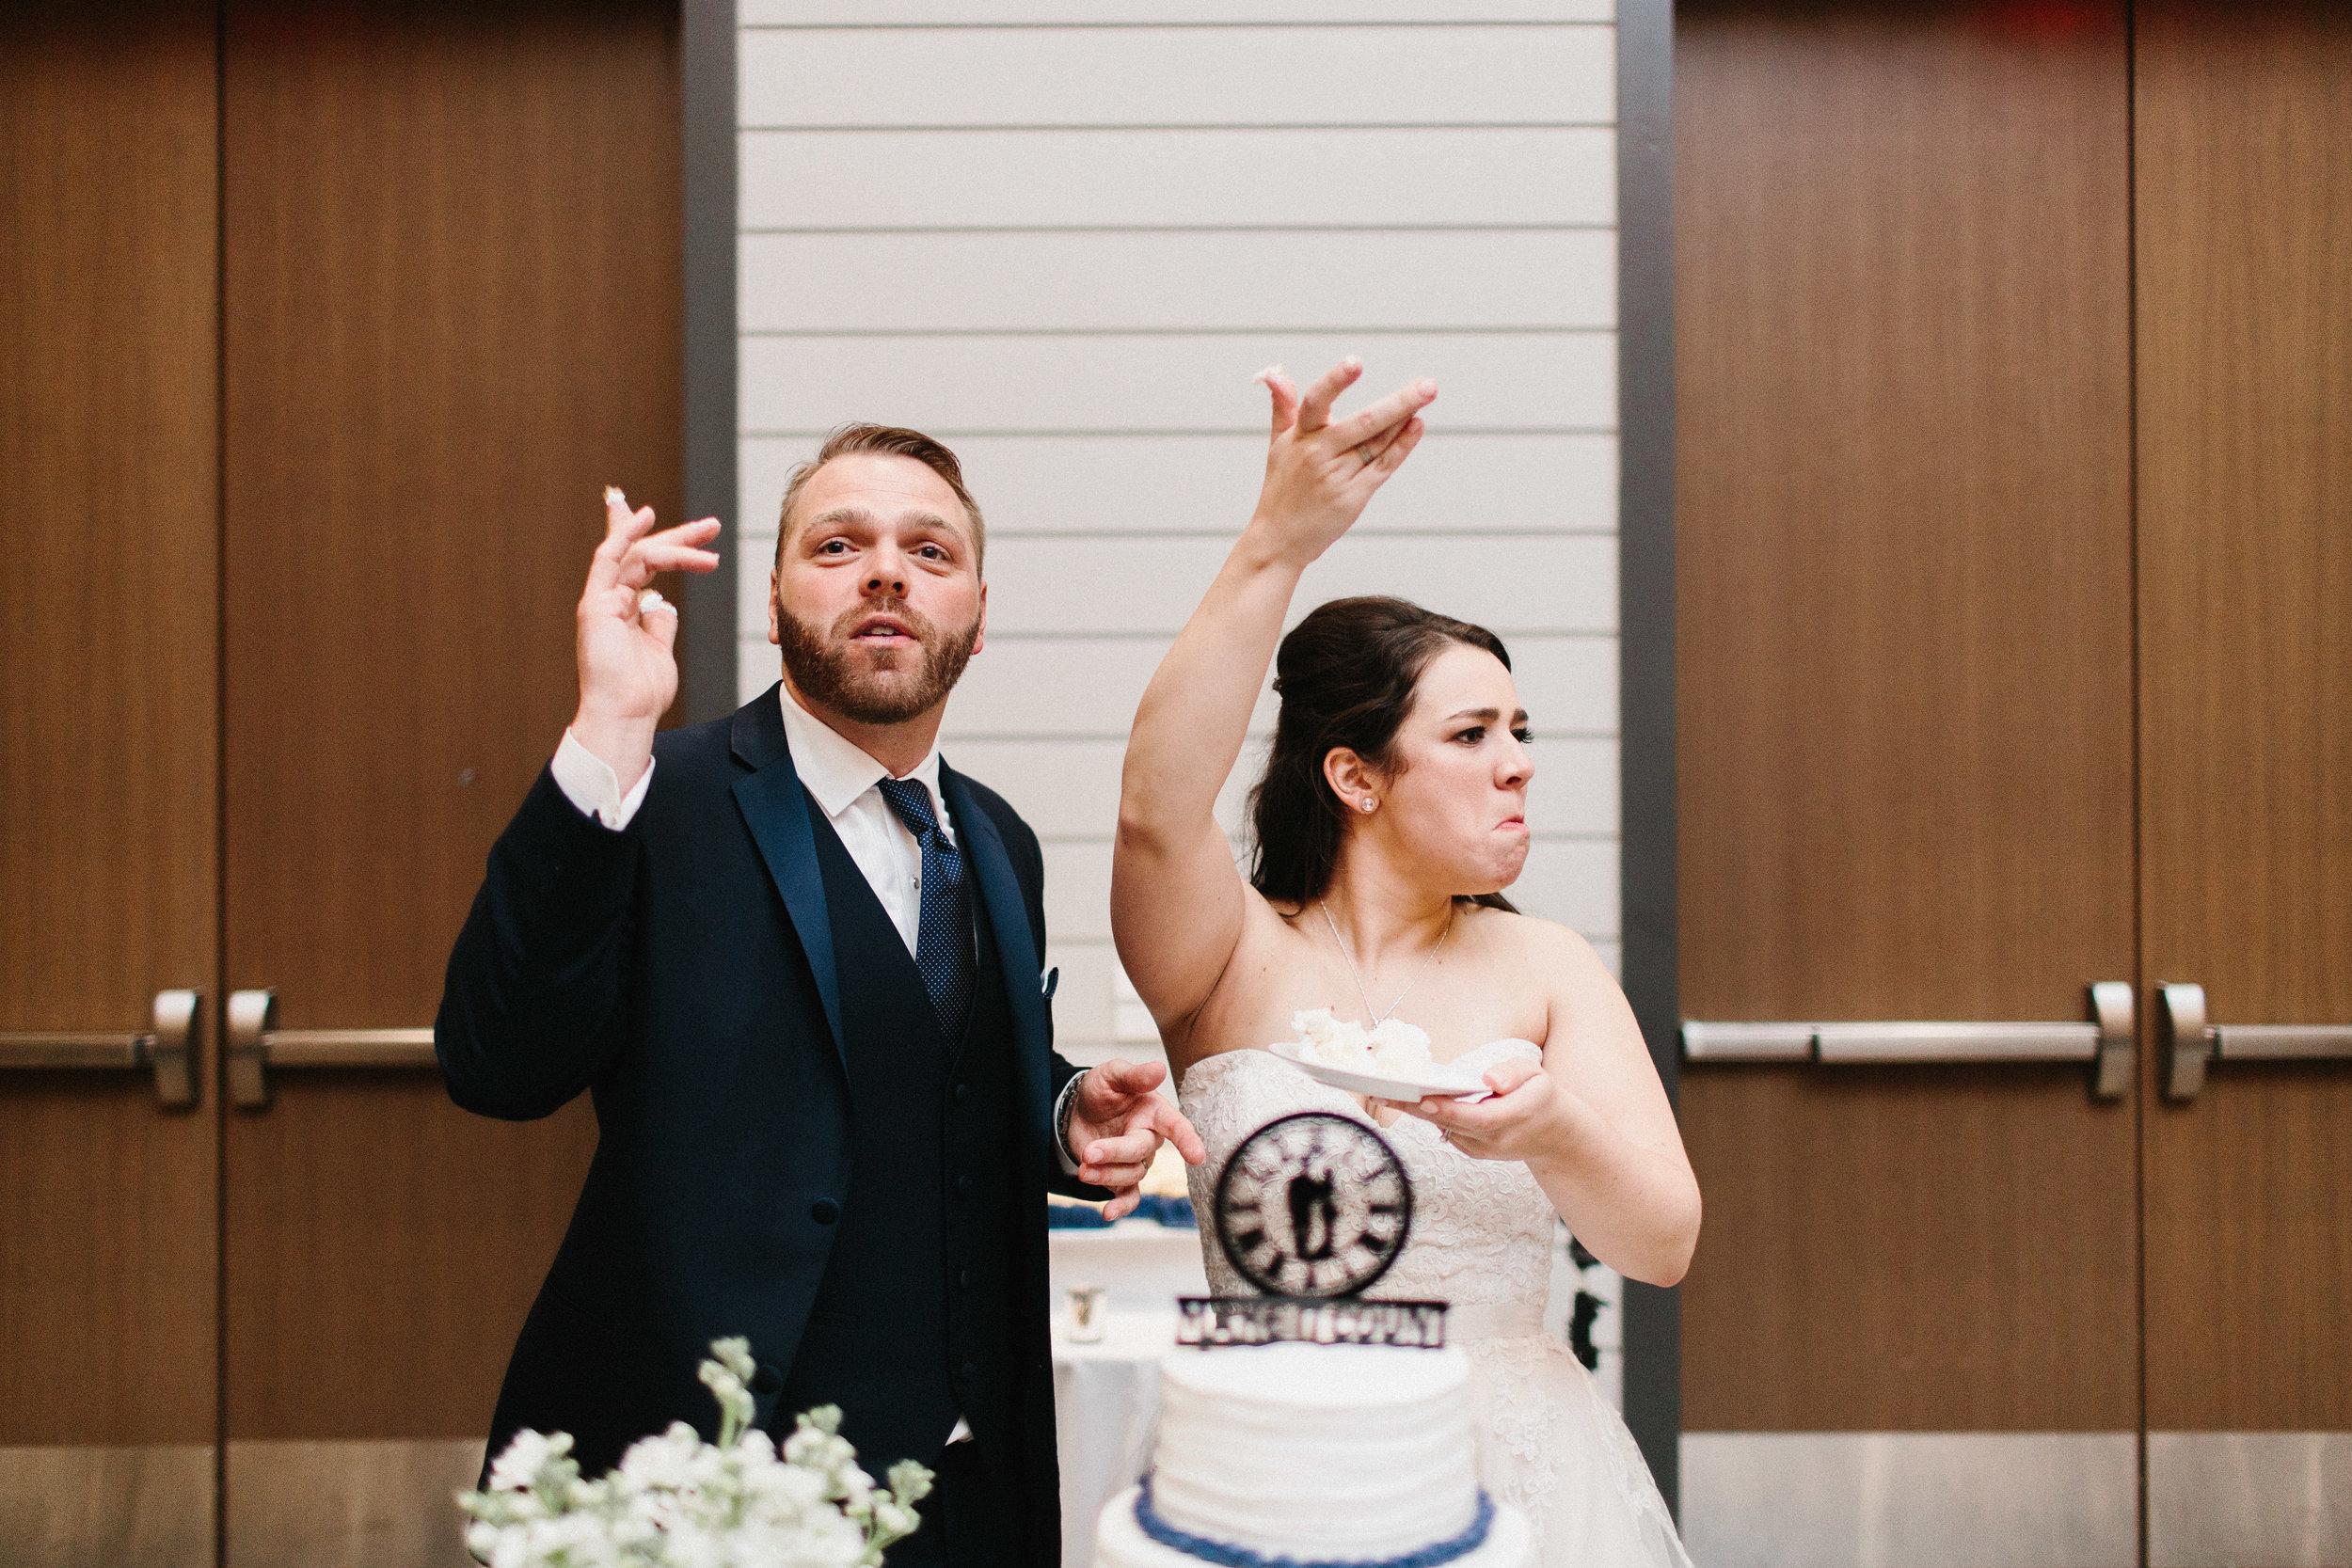 roswell_st_peter_chanel_catholic_avalon_hotel_alpharetta_wedding-2118.jpg